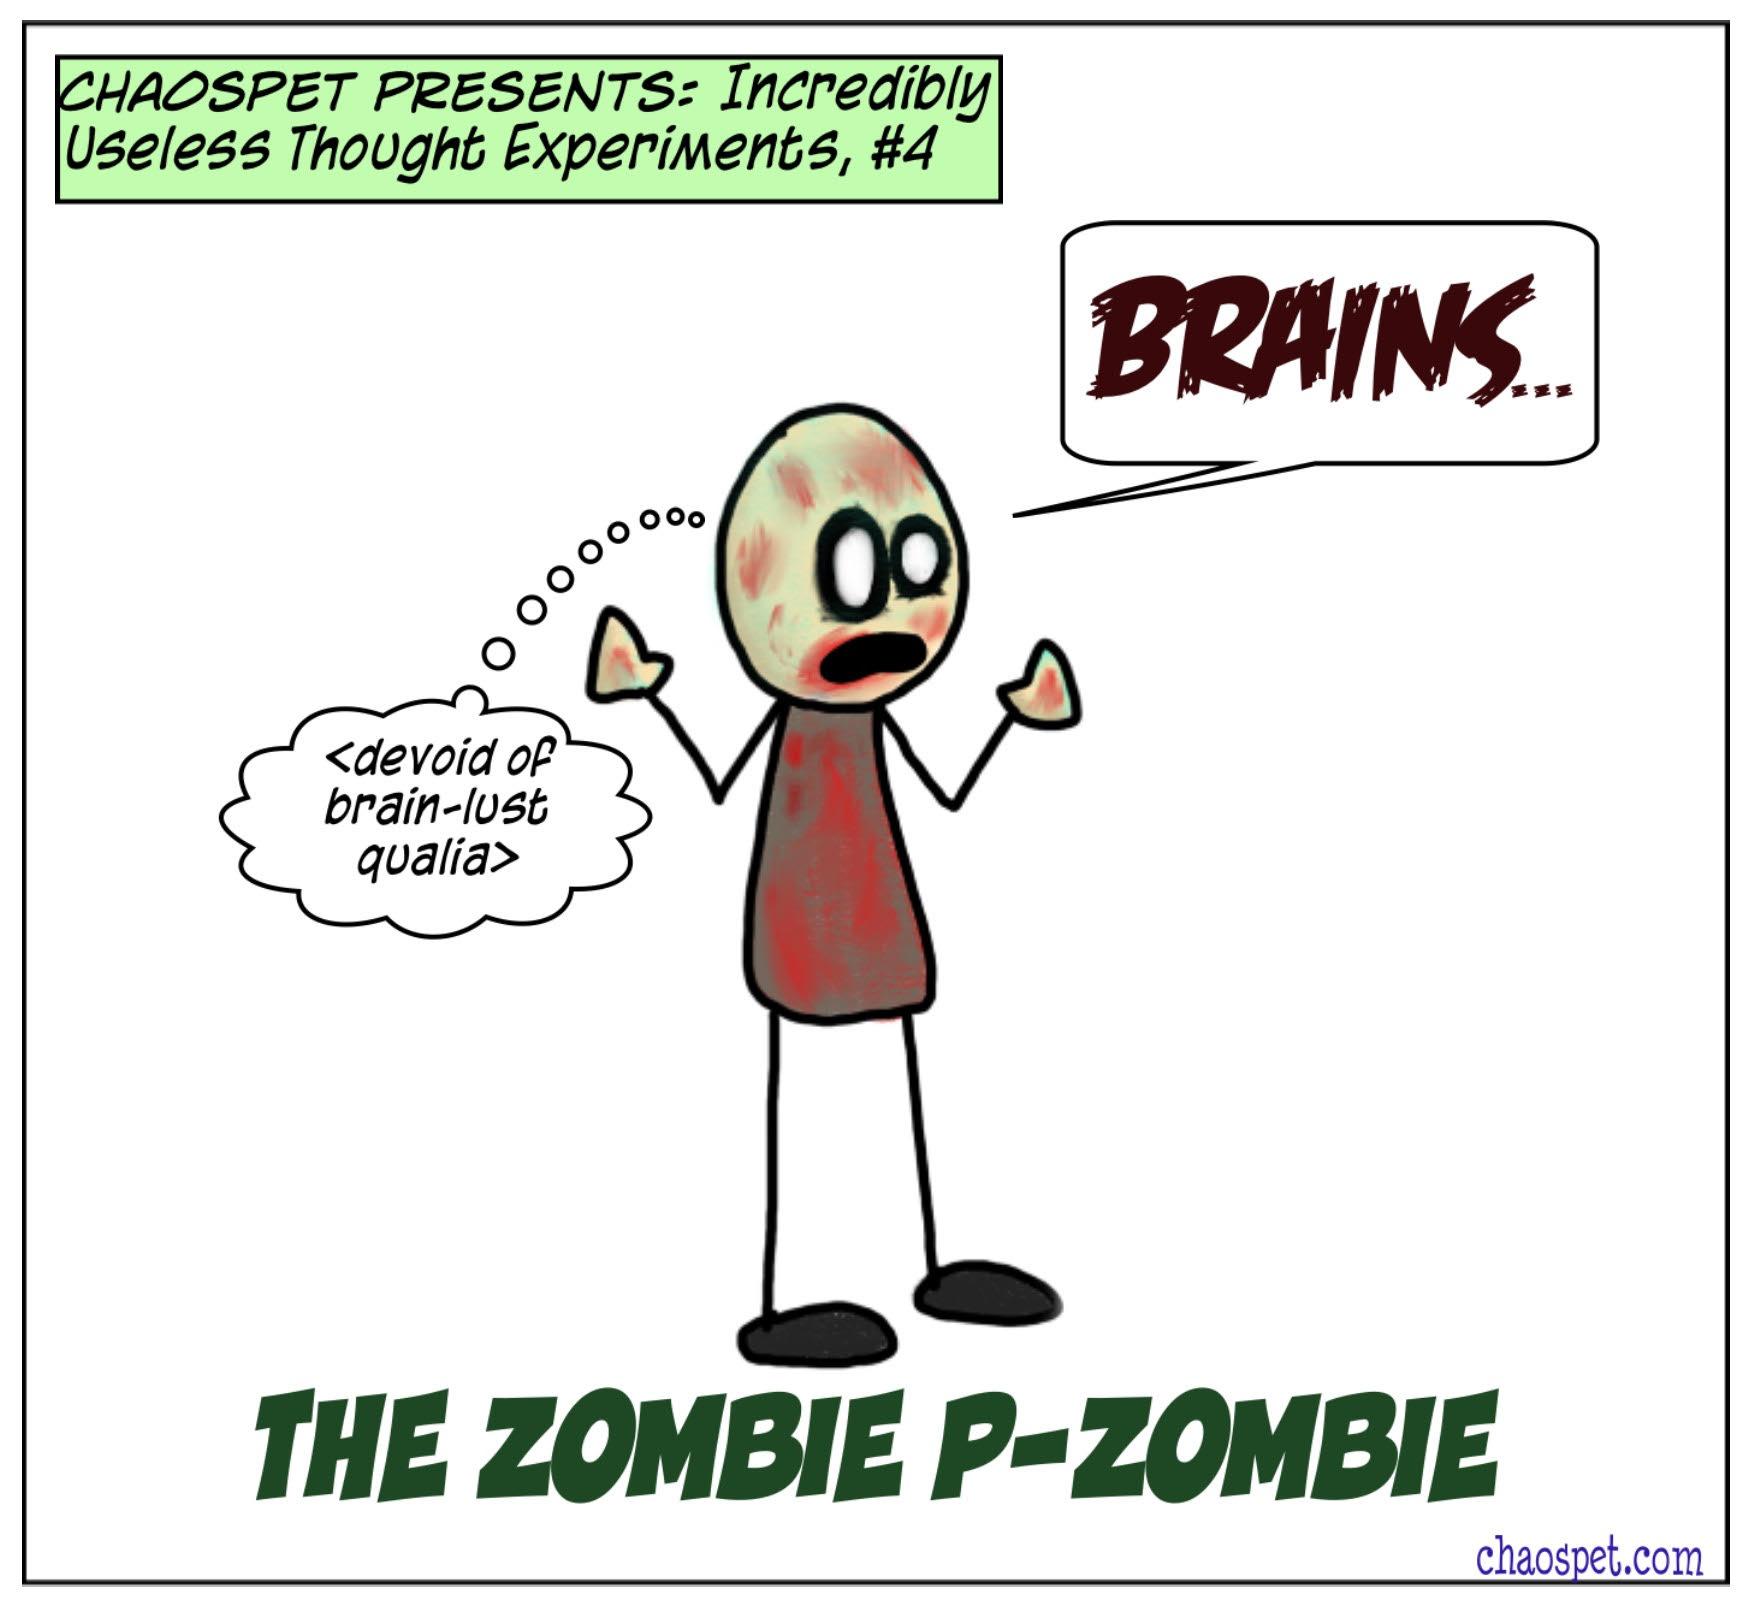 Lake - 2016-8-23 - zombie zombie